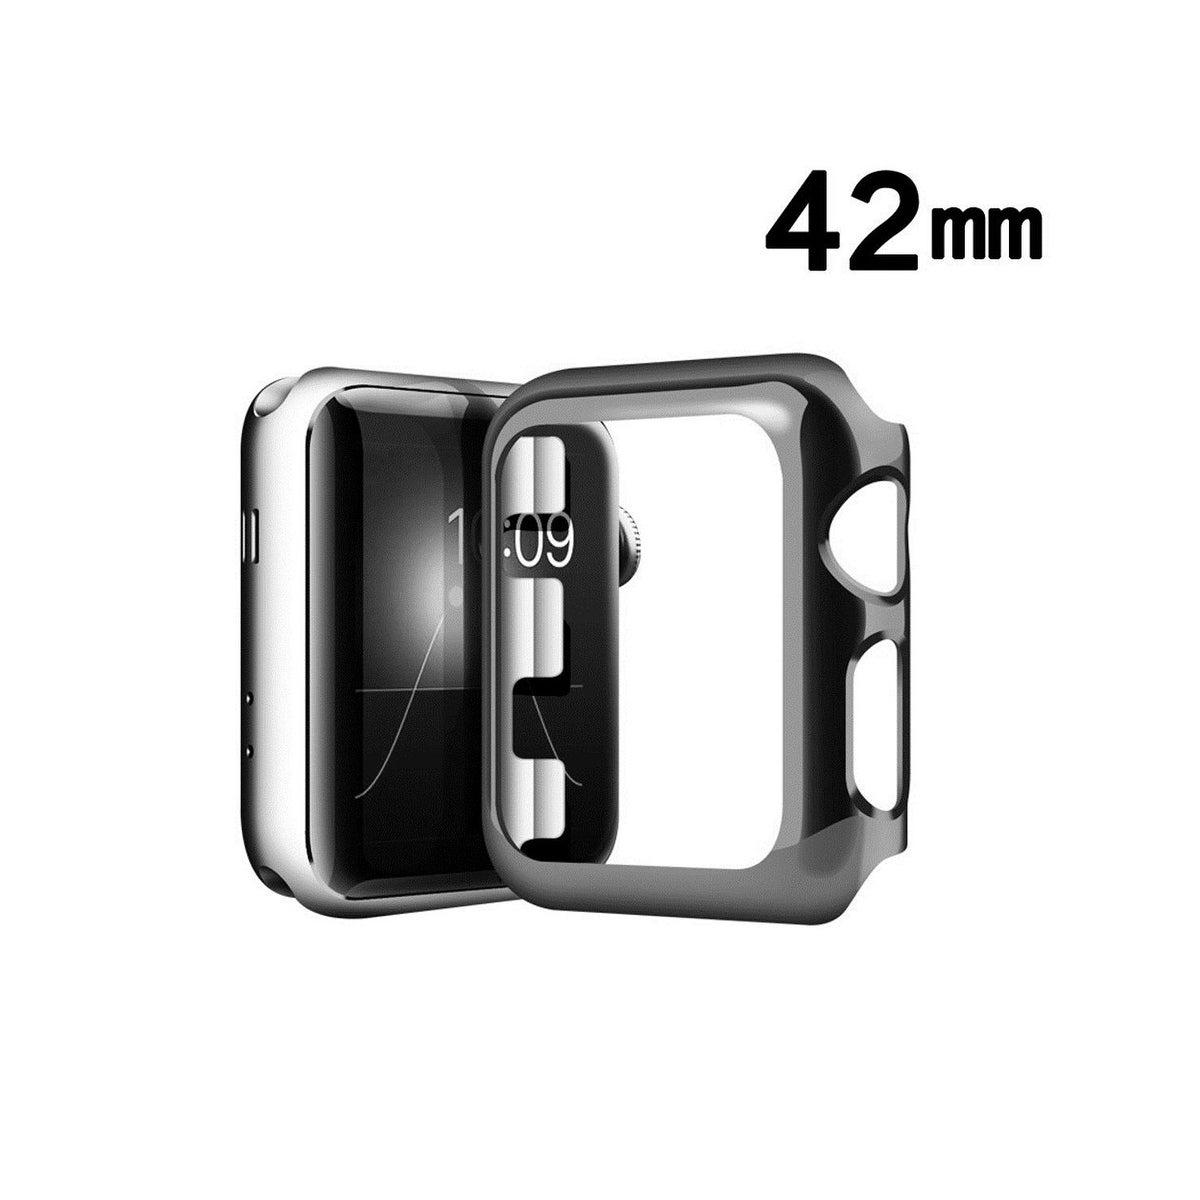 NAPOLEX JK56 Net Pocket M Curved Saturn console accessories